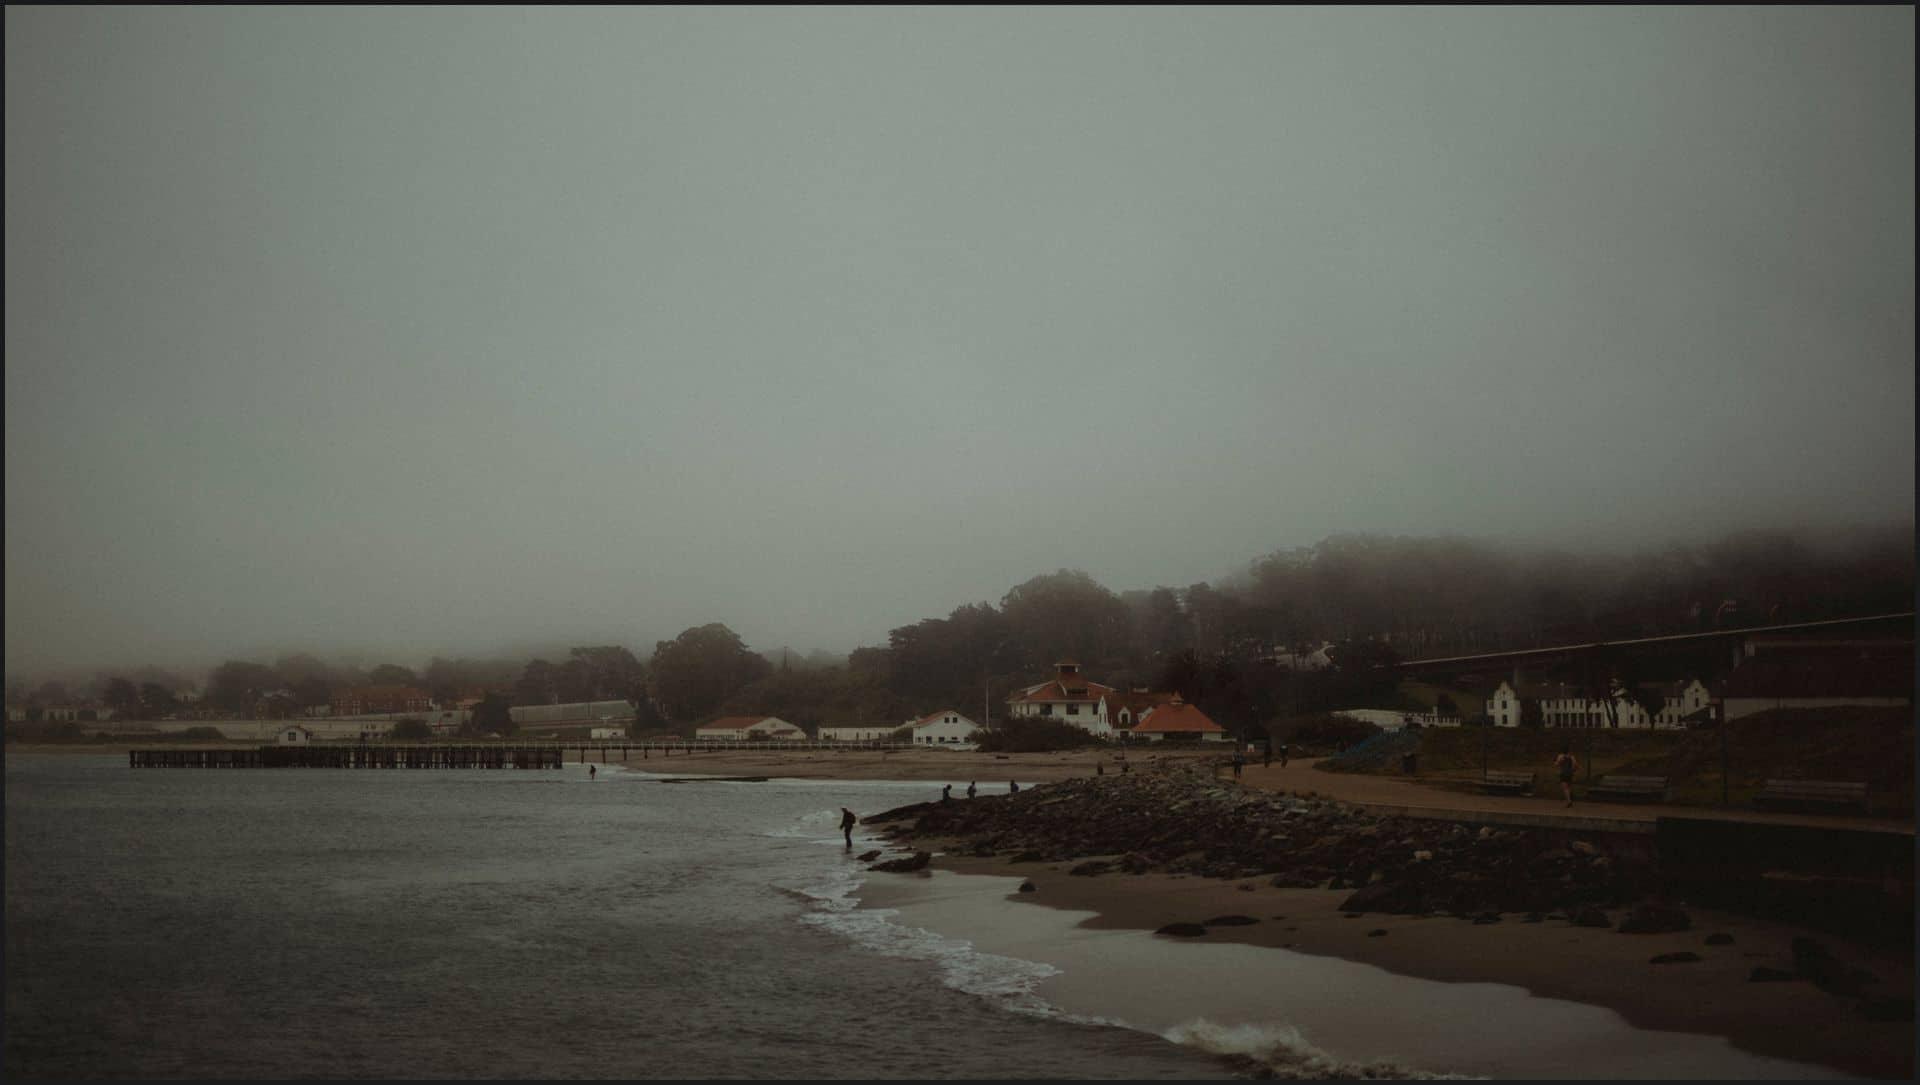 san francisco, california, elopement wedding, beach, ocean